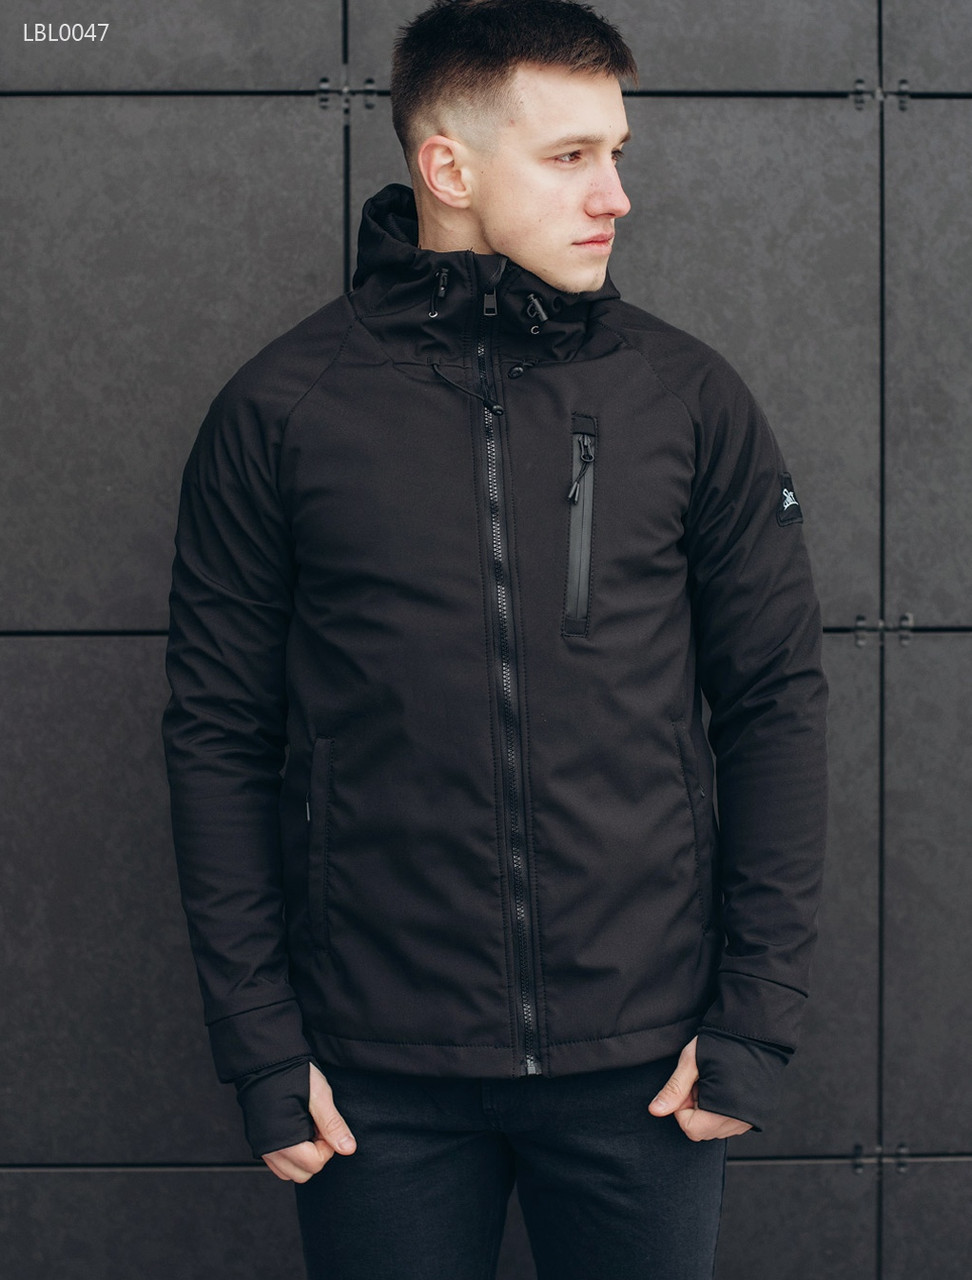 Весенне-осенняя куртка Staff - Soft shell Solar black Art. LBL0047 (Размеры  - XS d32bfa8f2face